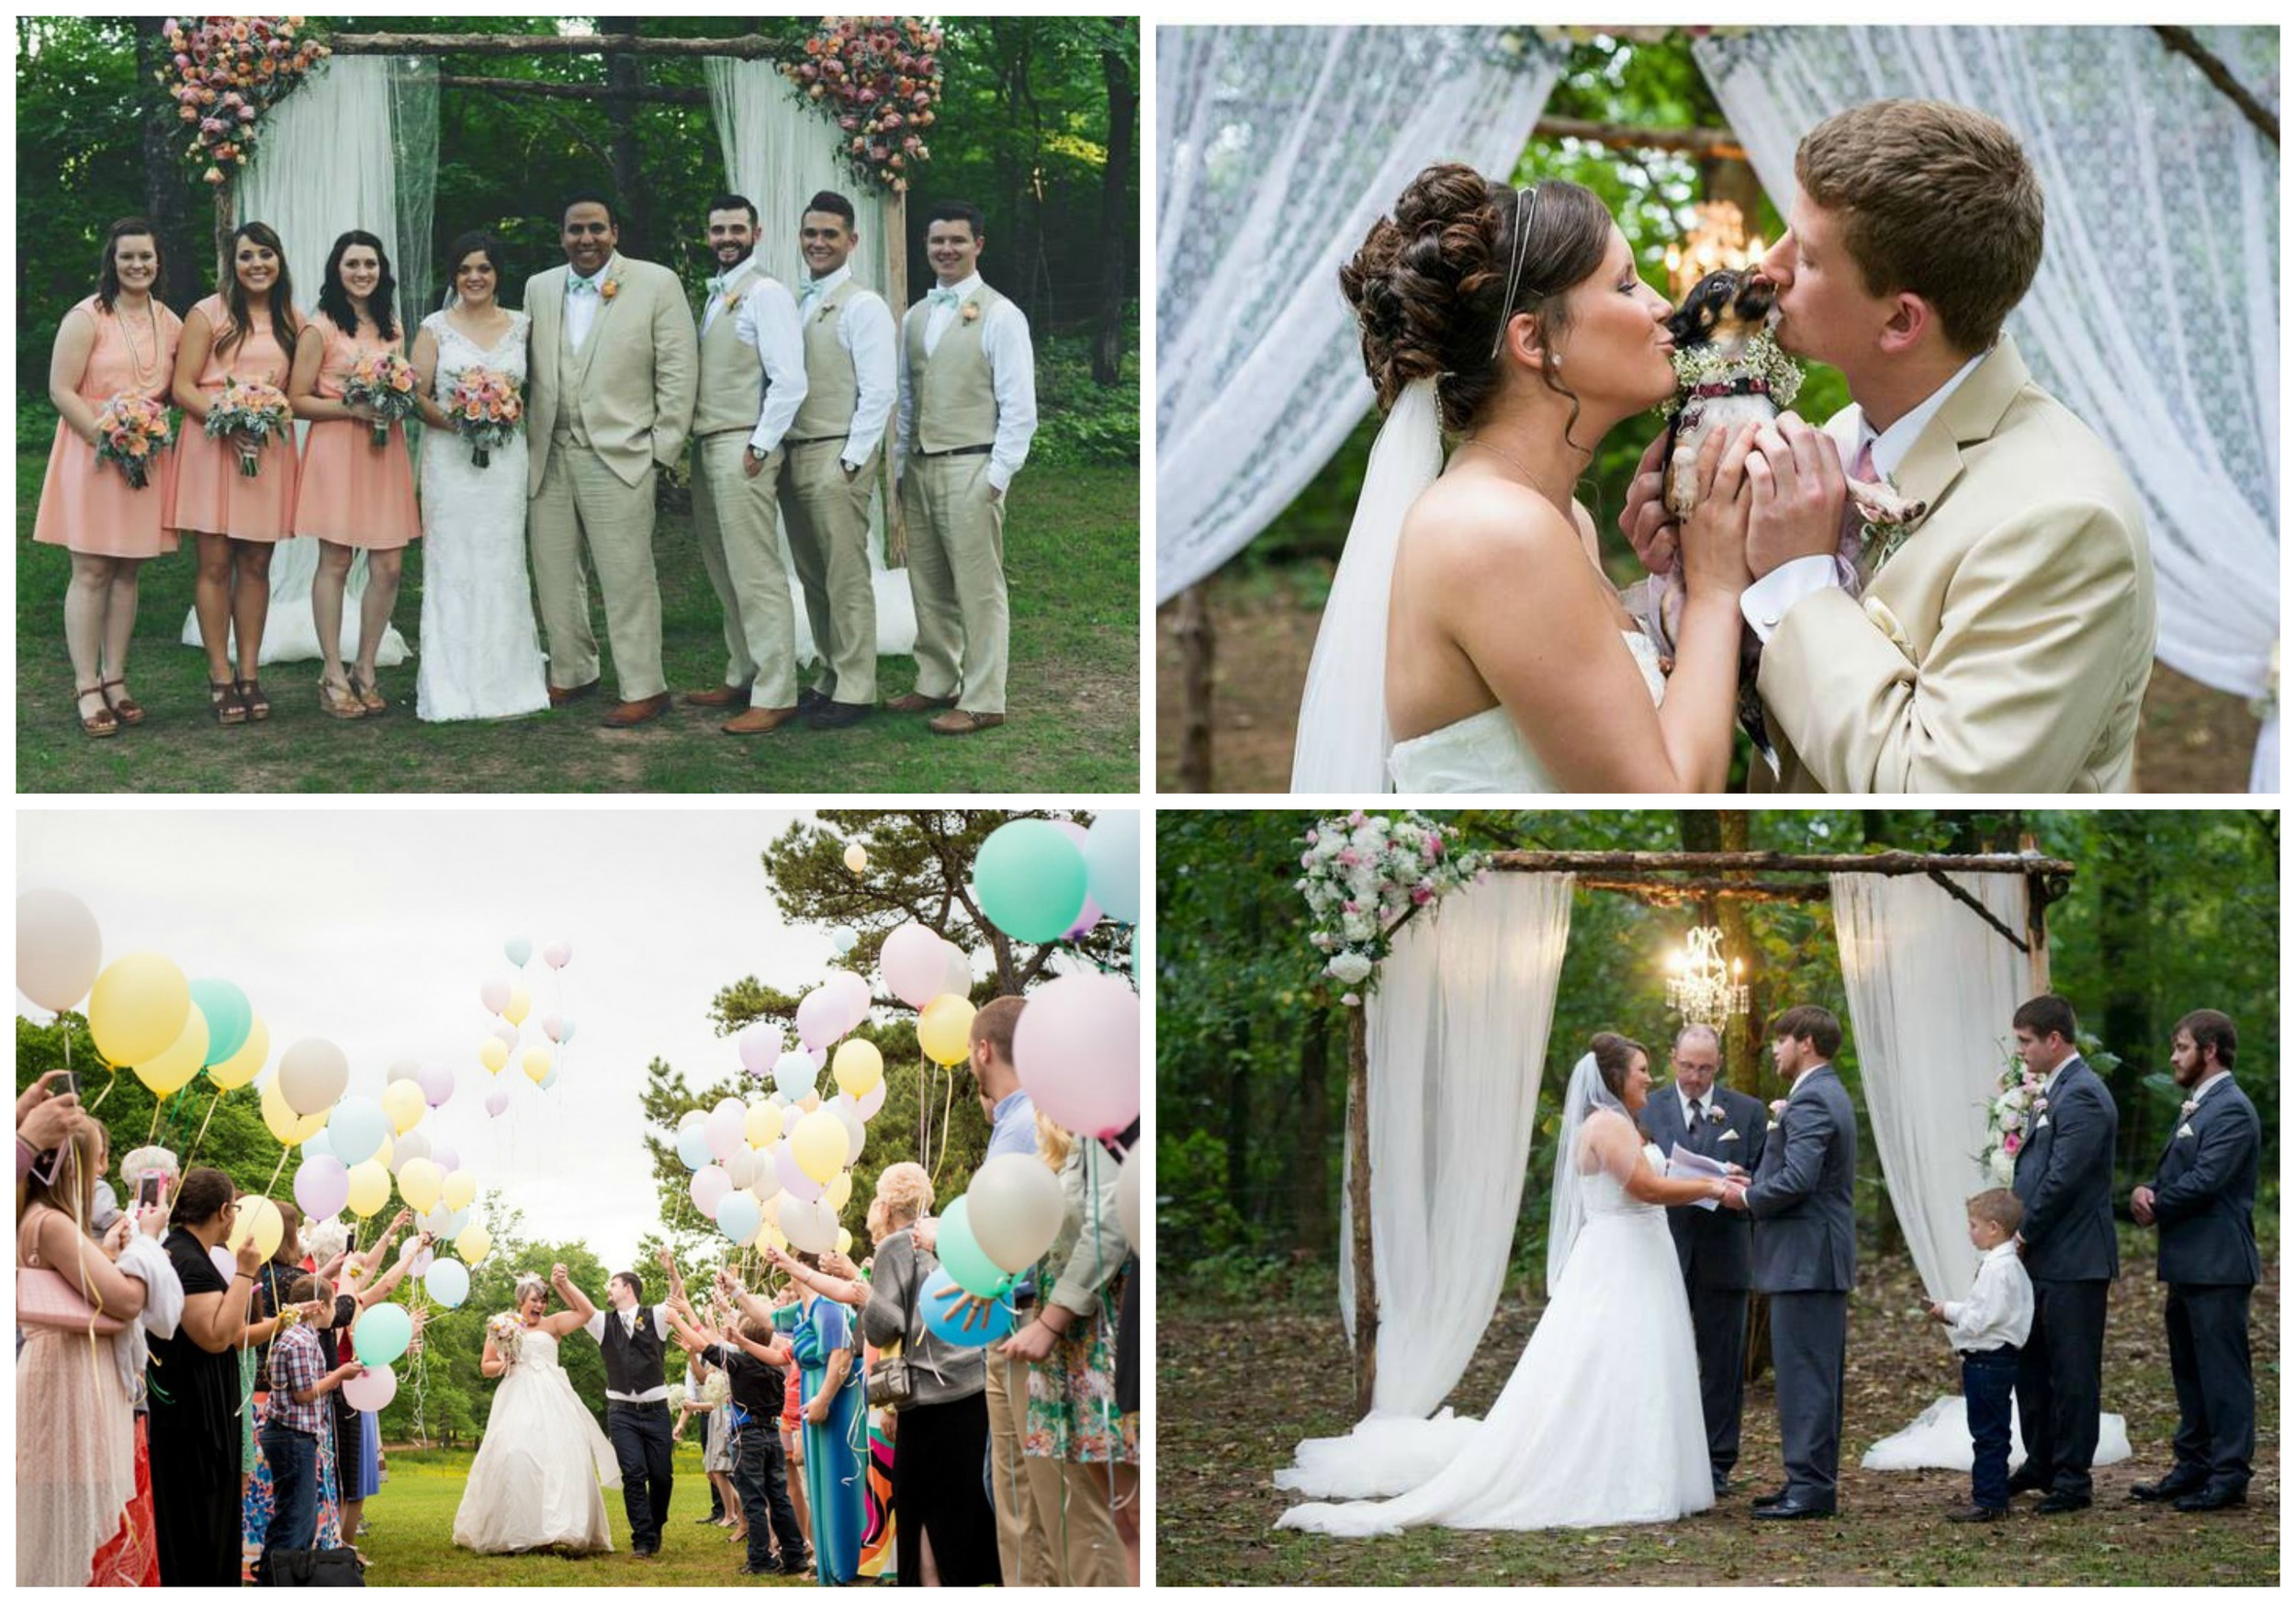 Andrew Arceri ;  Tryston Hines Photography ;  Tryston Hines Photography ;  Danielle Davis Art/Photography